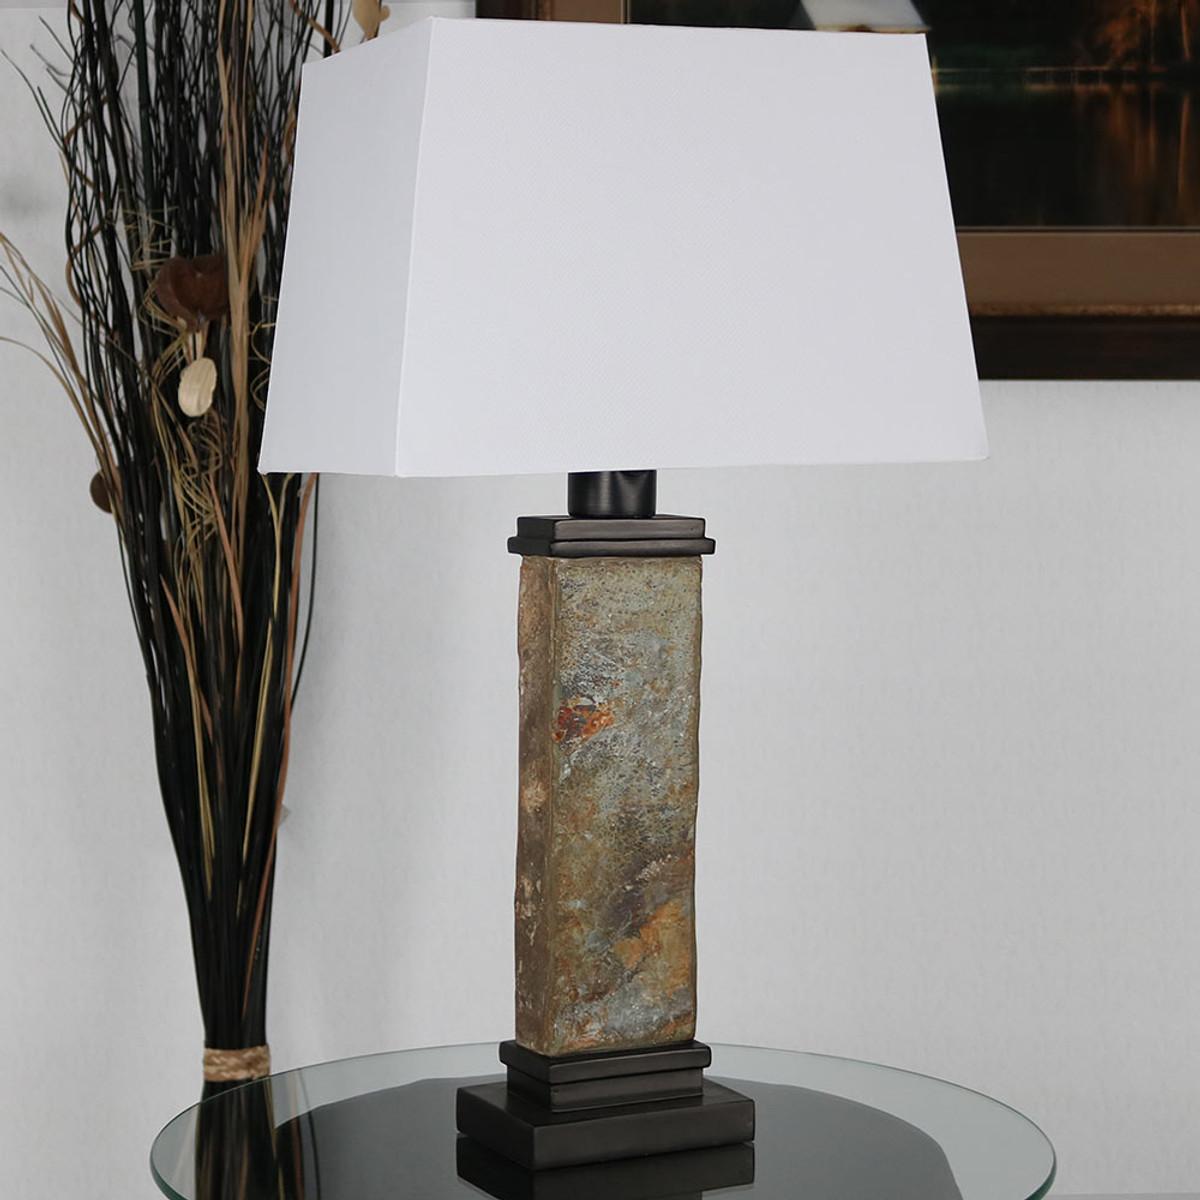 Sunnydaze indooroutdoor thin natural slate table lamp 26 inch tall sunnydaze indooroutdoor thin natural slate table lamp 26 inch tall aloadofball Gallery